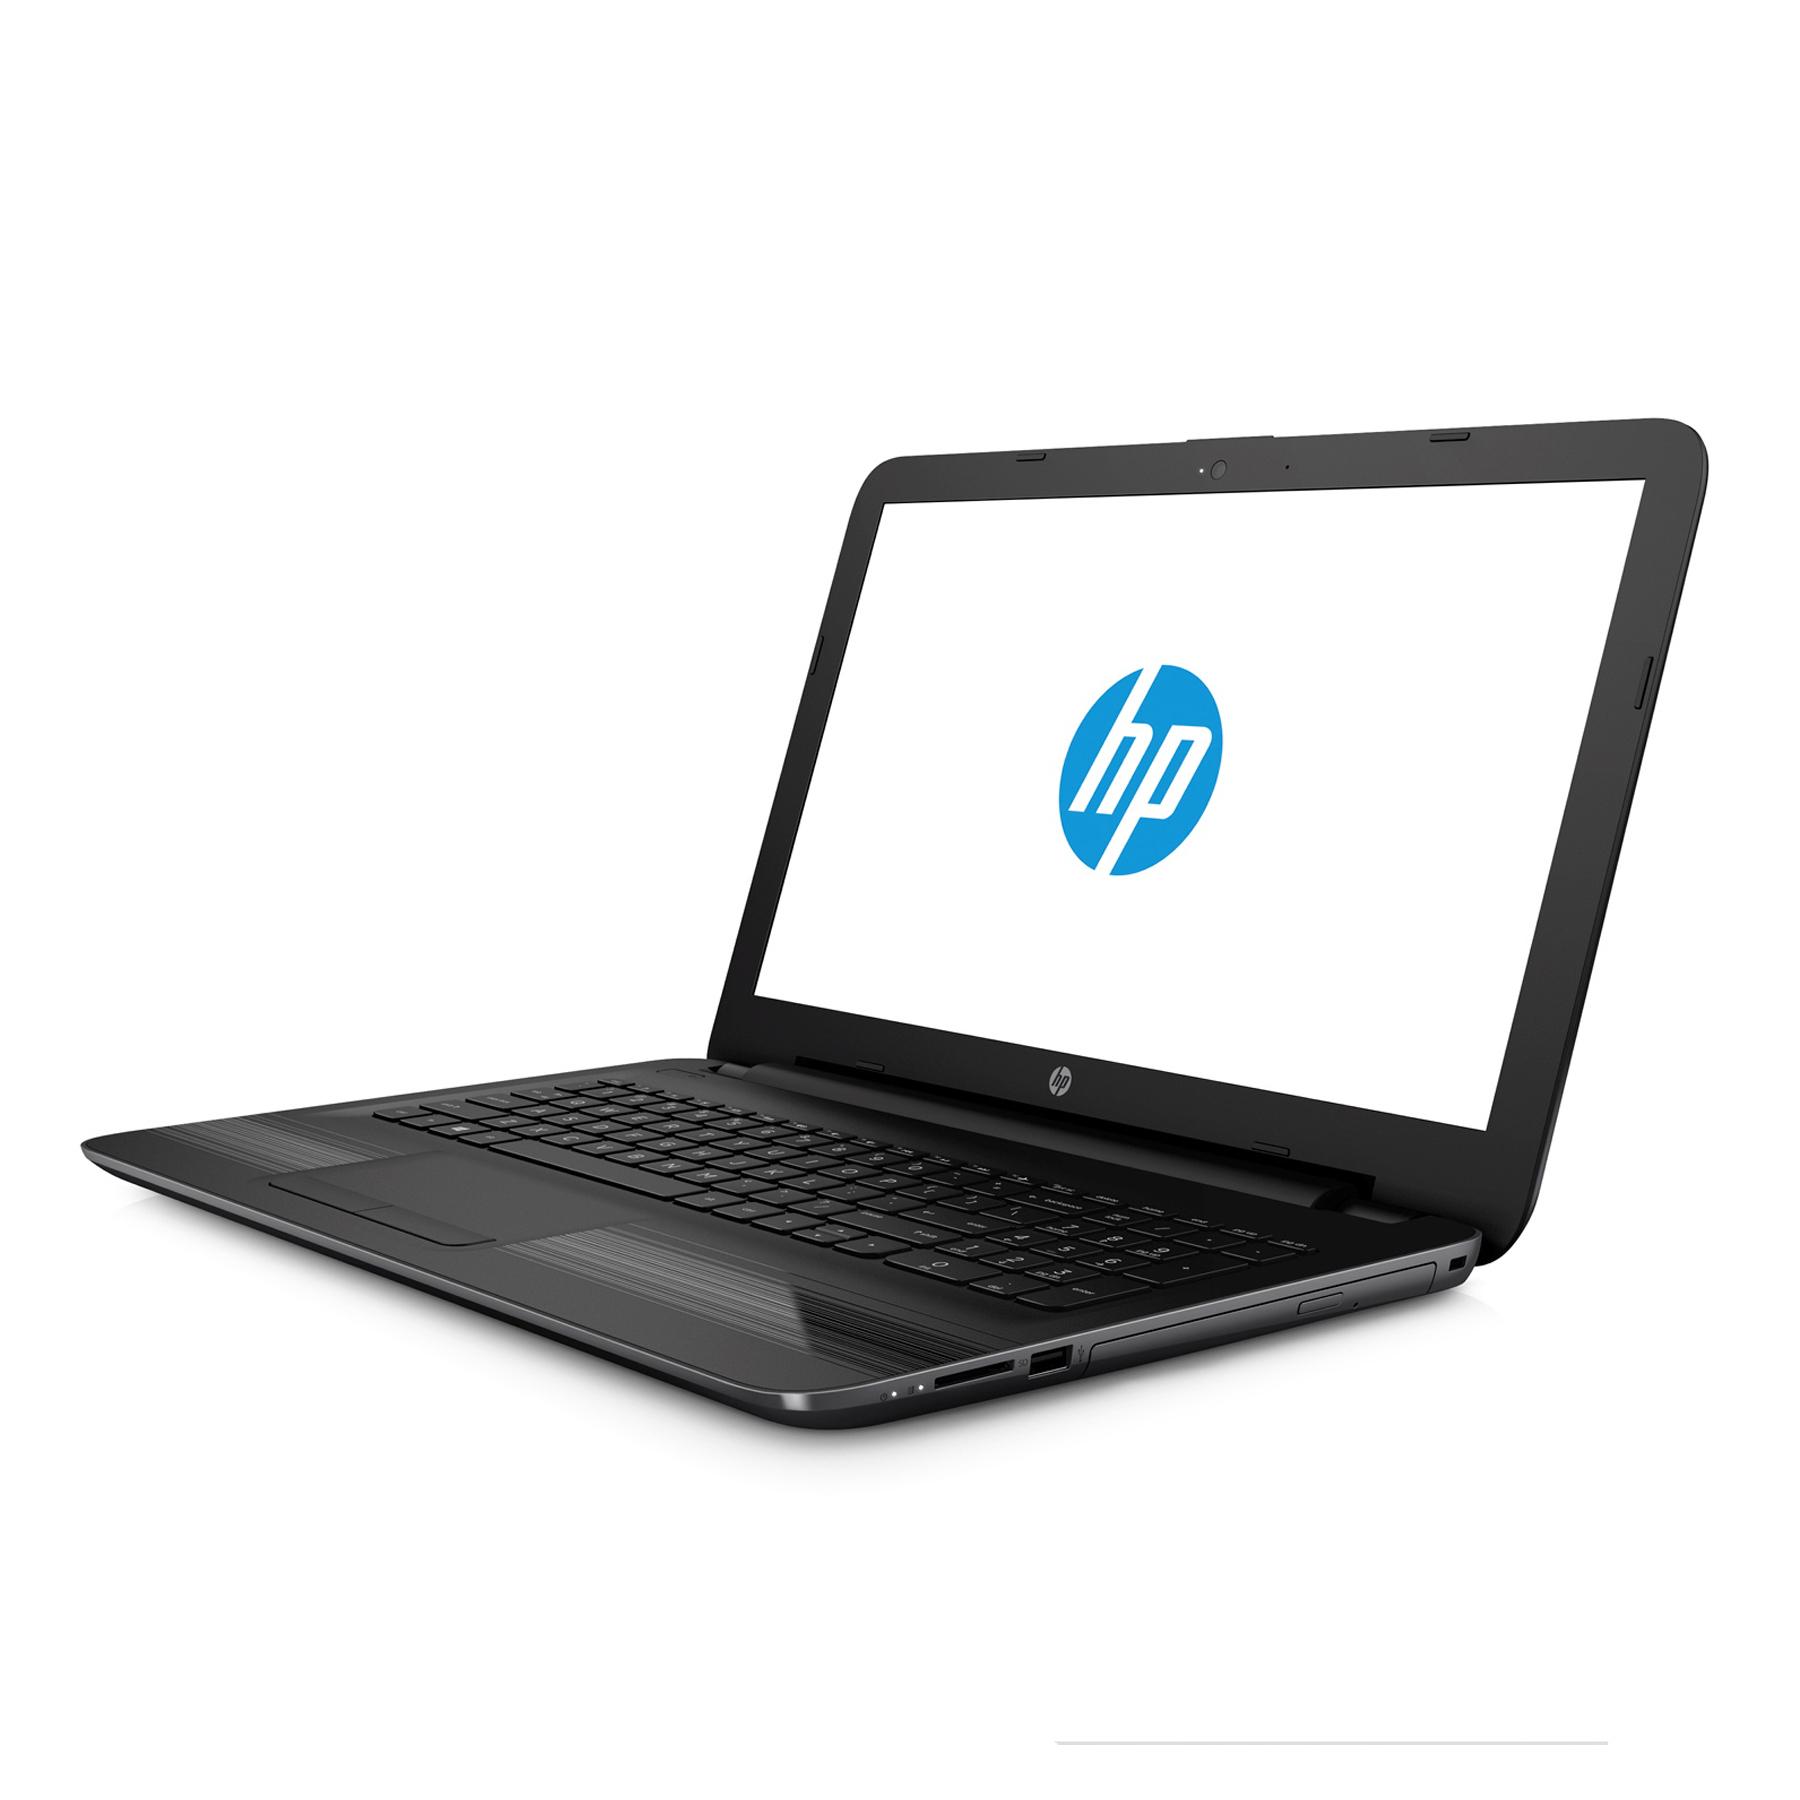 "[notebooksbilliger.de] HP 15-ba043ng Laptop - AMD Quad-Core A6-7310, 4GB DDR3L, 128GB SSD, 15,6"" HD Display, DVD-RW, FreeDOS 2.0 - 222 Euro"